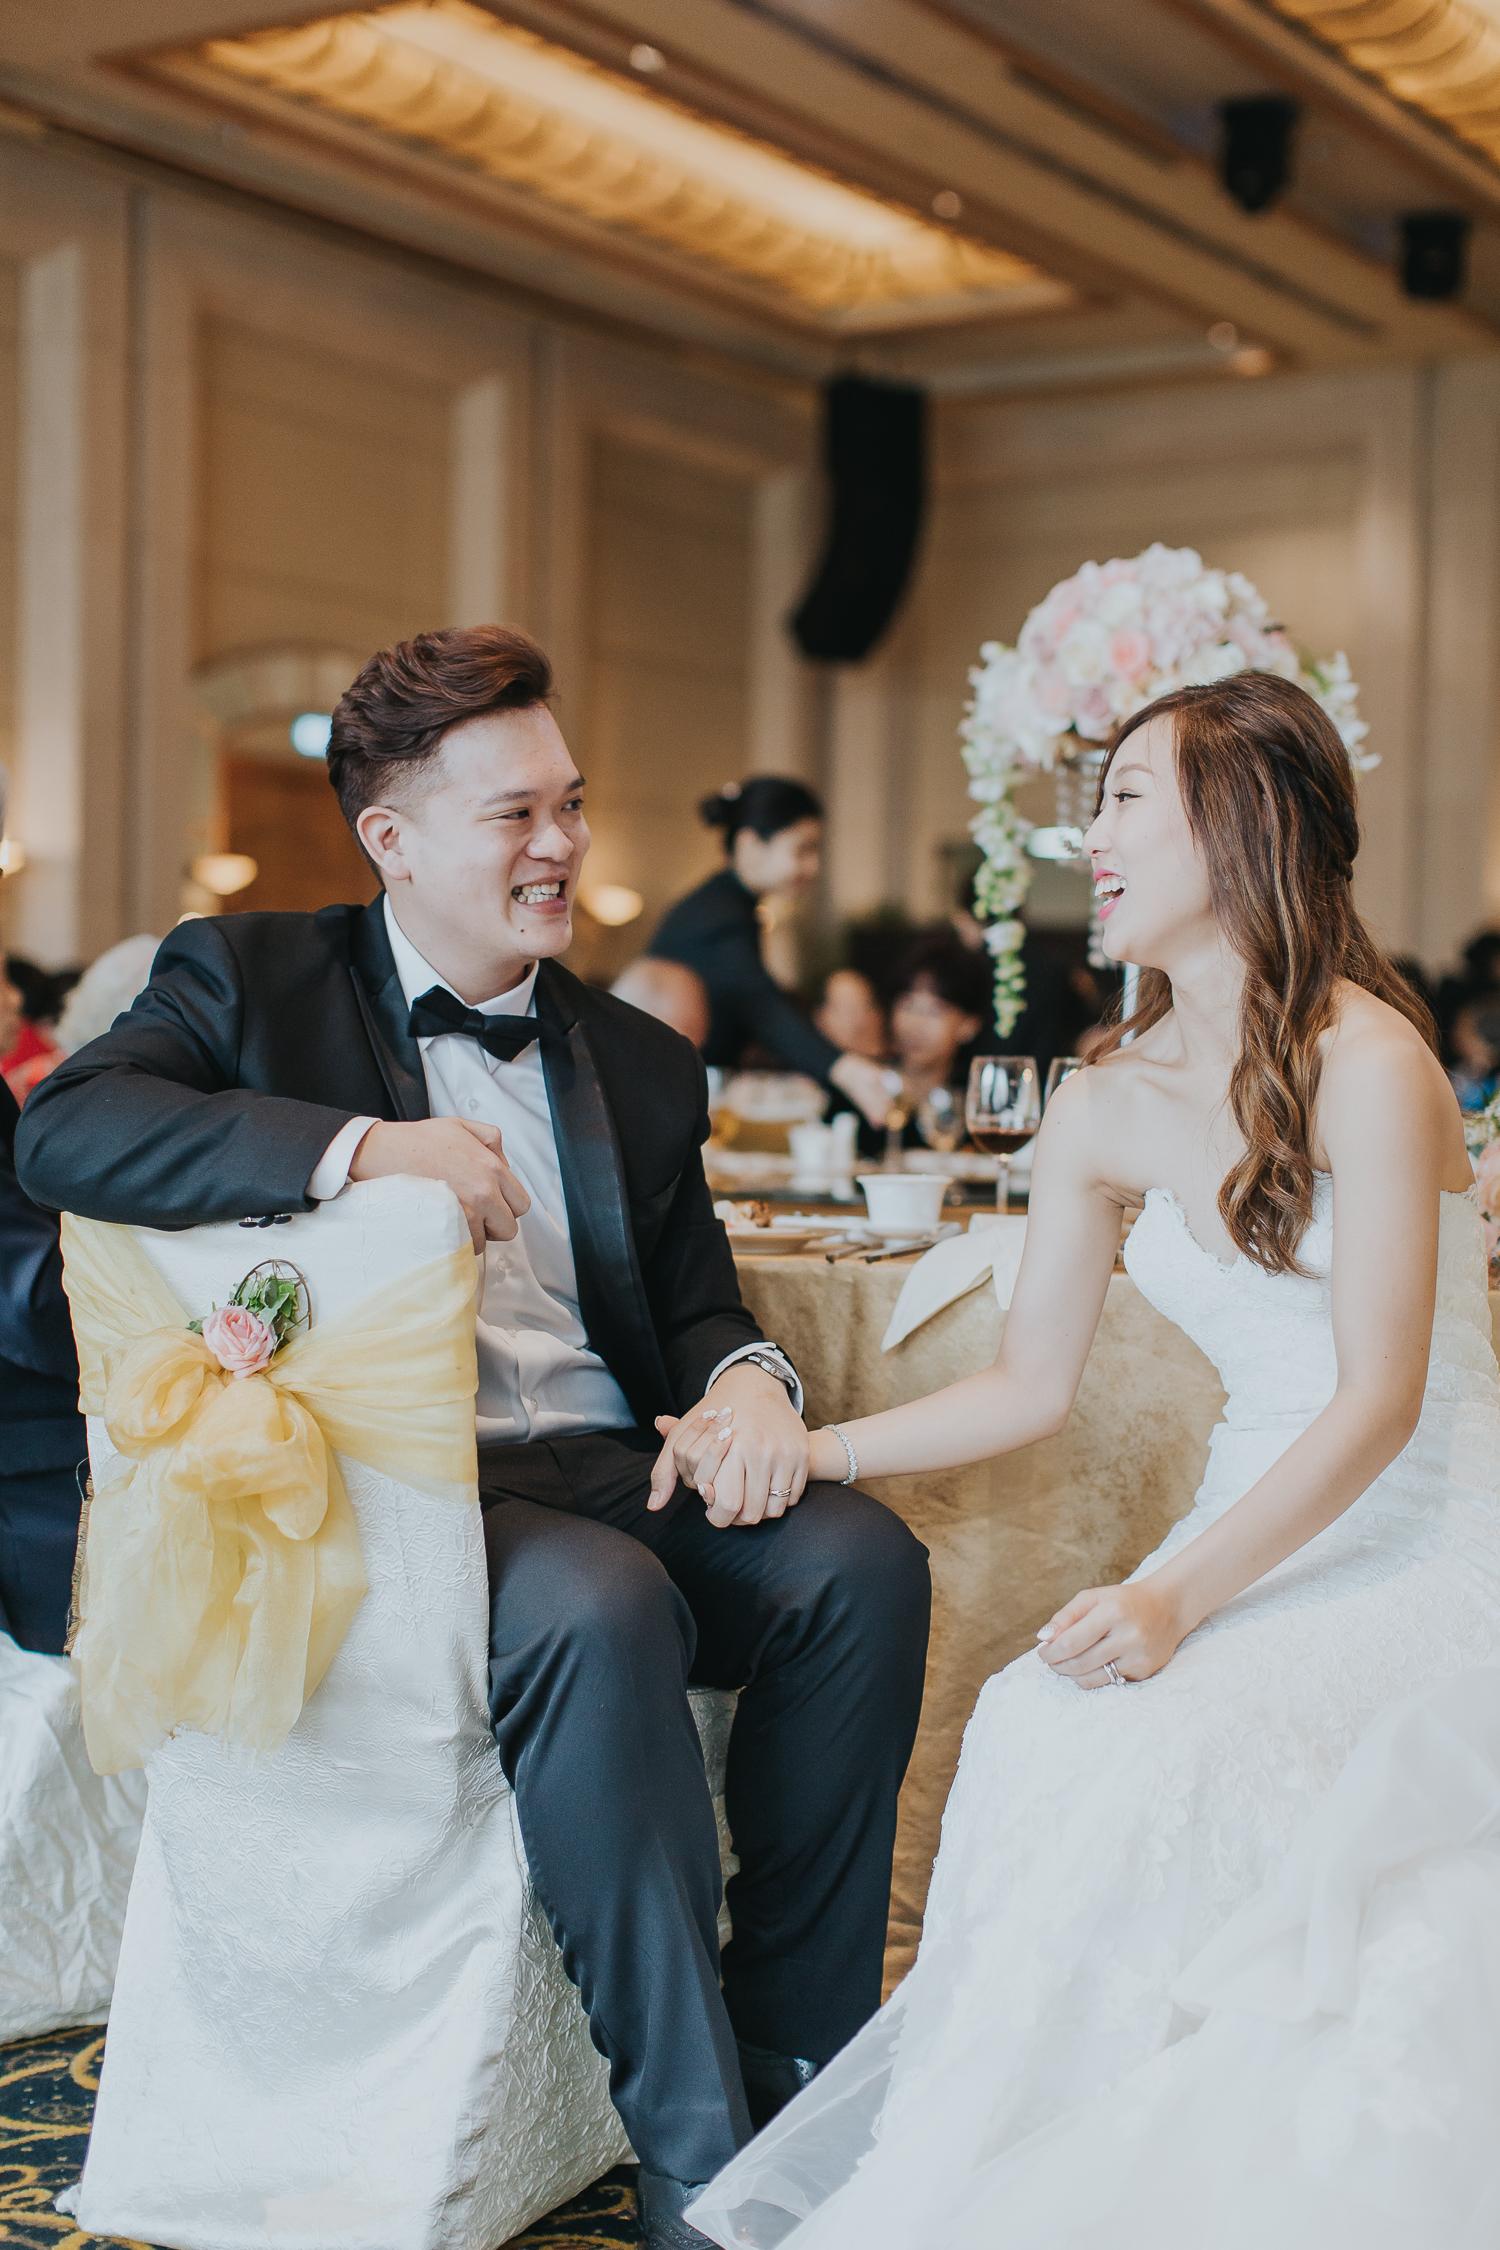 Singapore+Actual+Day+Wedding+Photographer+Grand+Mercure+Oliver+Estelle-0090.jpg